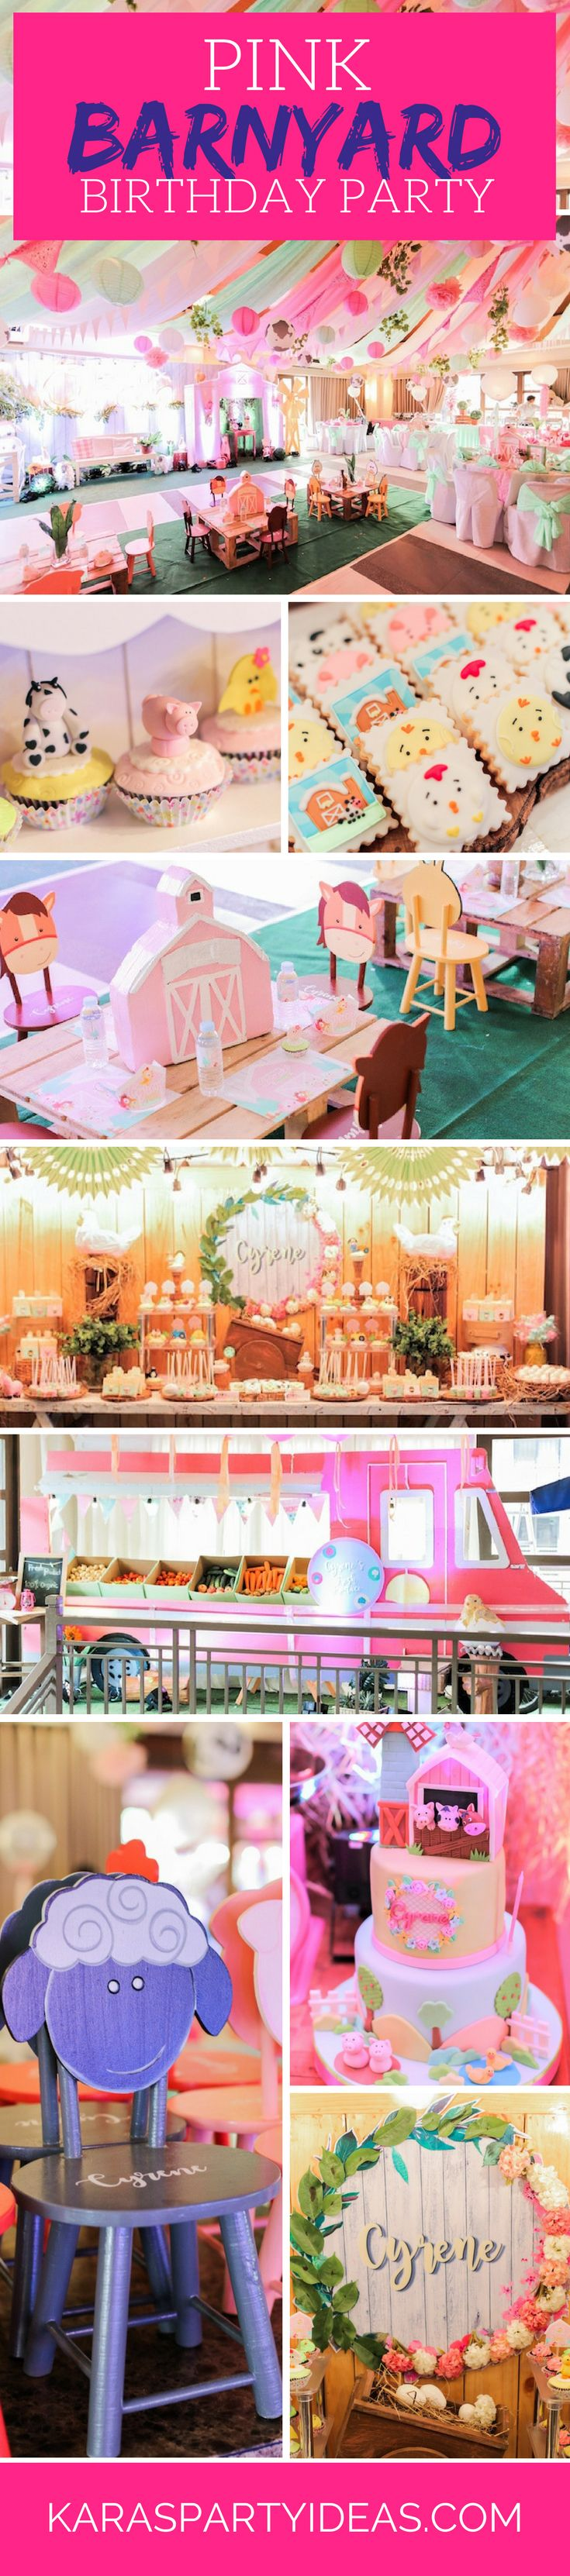 Kara s party ideas rustic country barn wedding party ideas supplies - Pink Barnyard Girl Farm Birthday Party Via Kara S Party Ideas